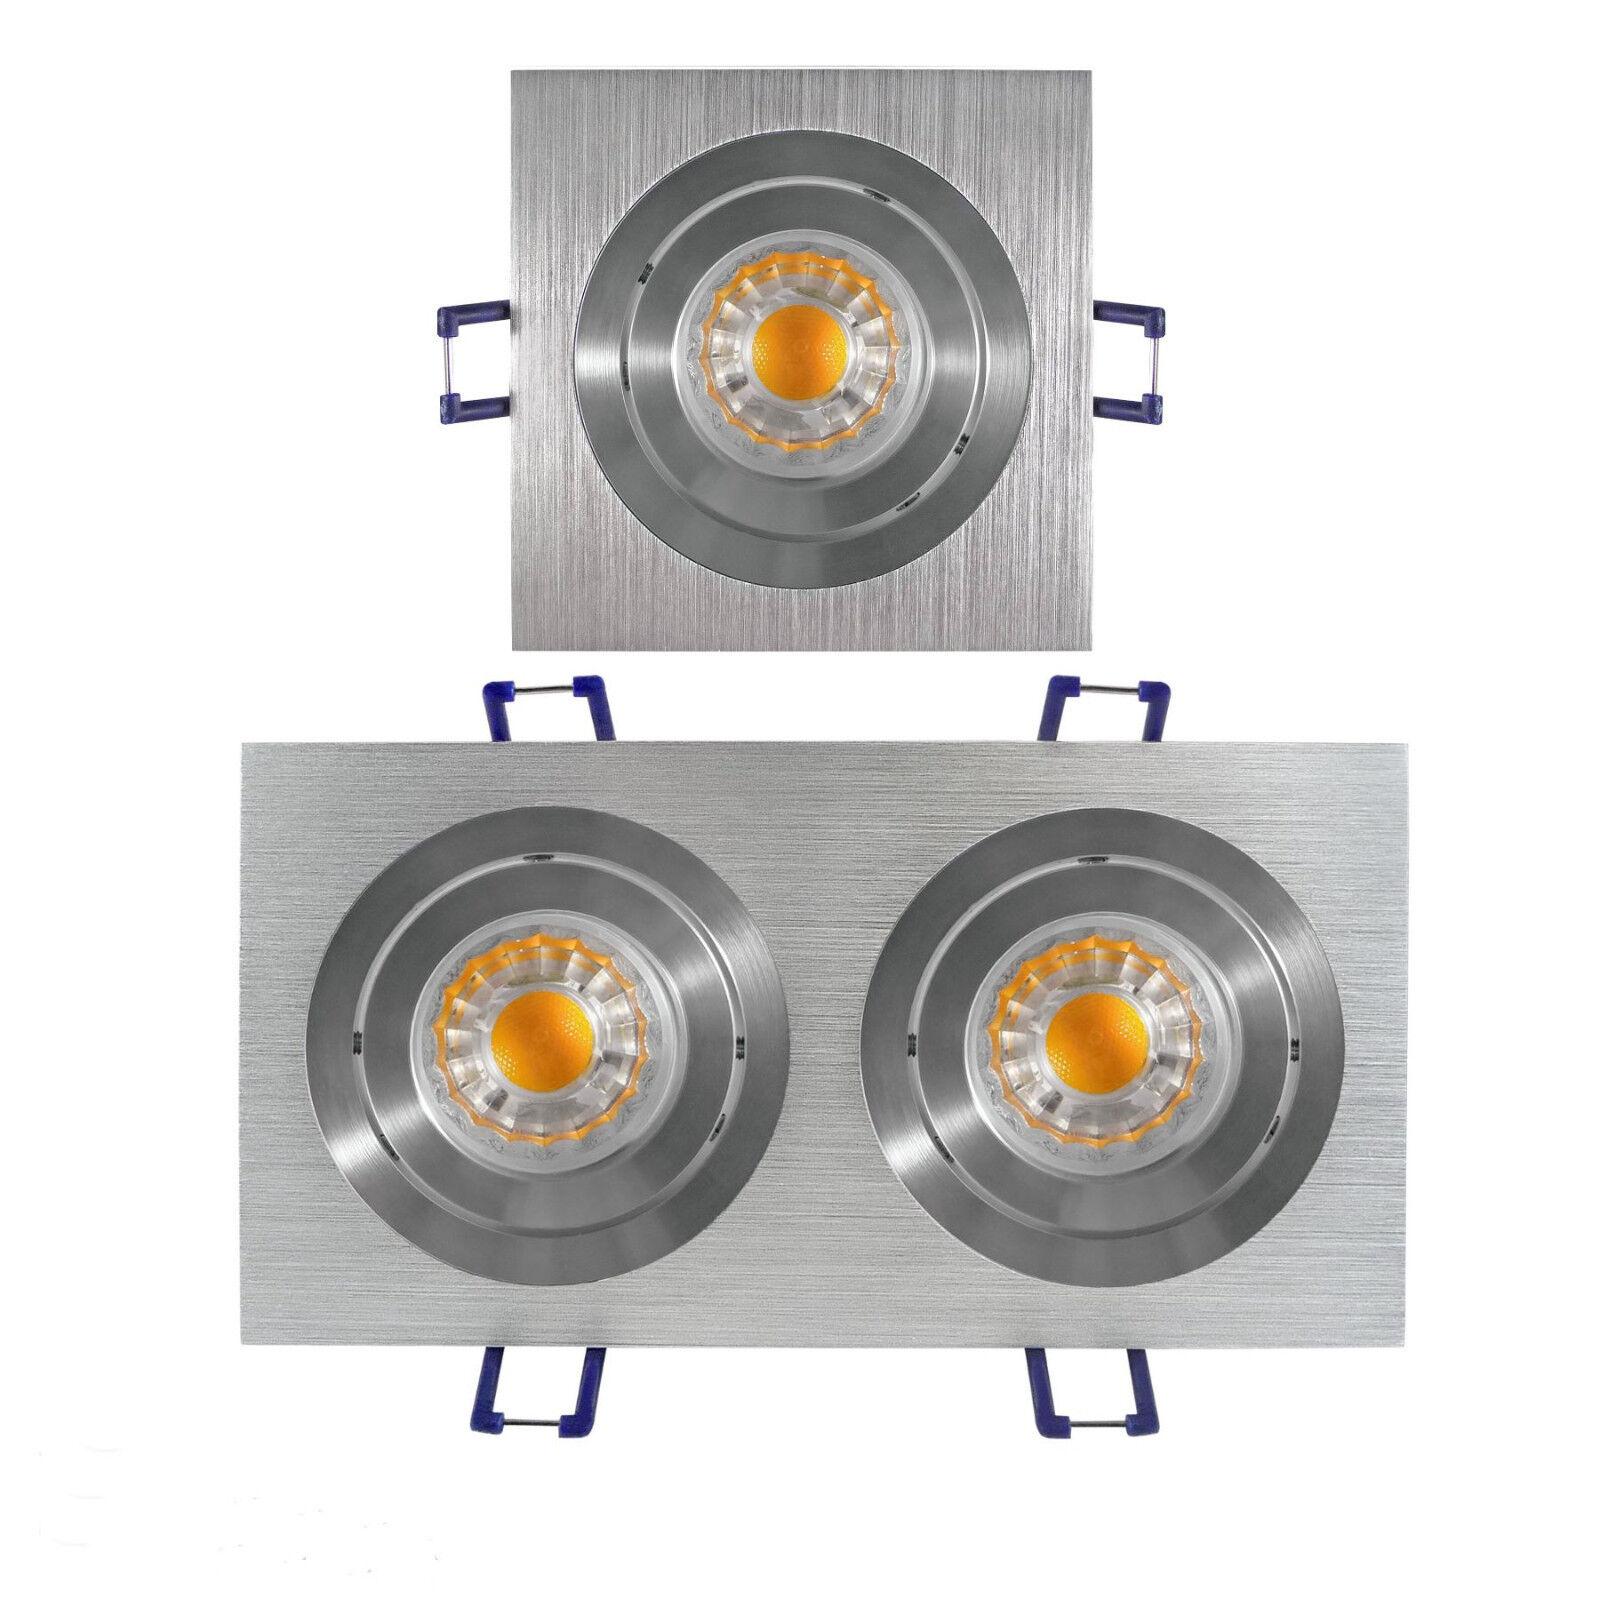 LED Einbaustrahler GU10 LED Einbauleuchte GU10 230 Volt Oberon COB LED GU10 230V